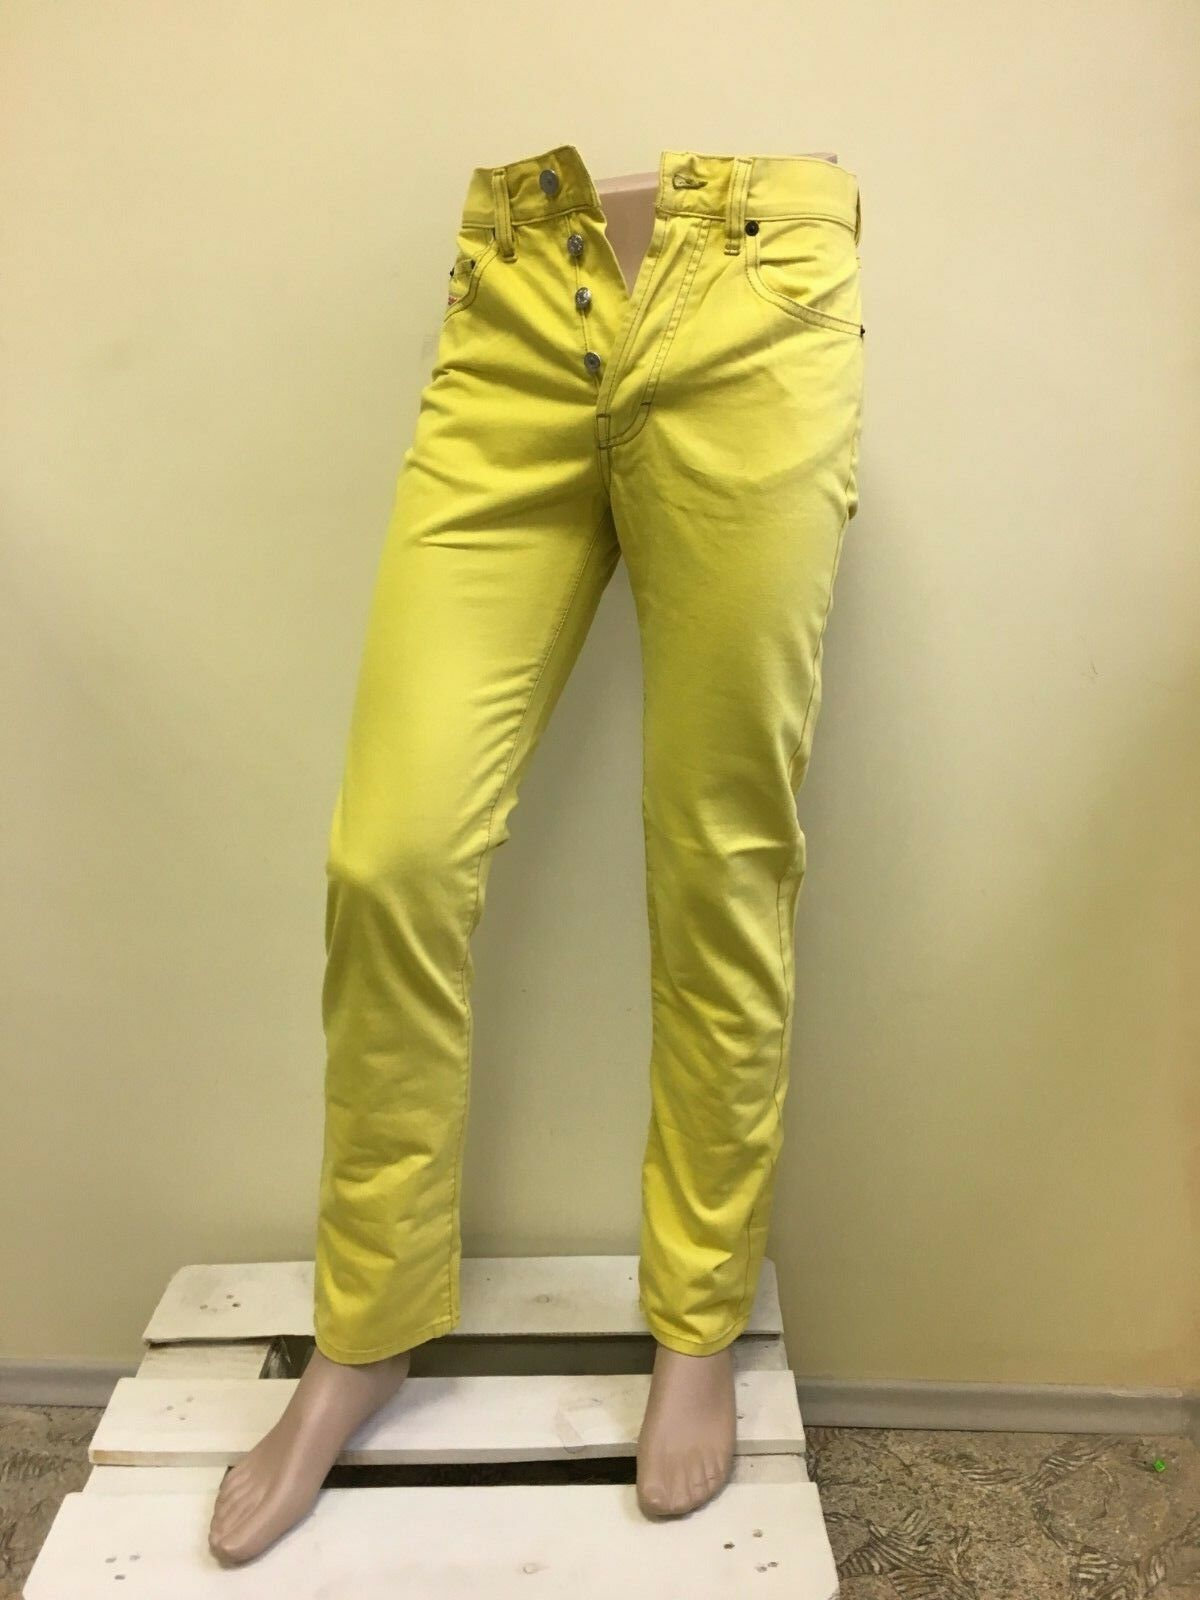 Diesel men's yellow jeans Size 28